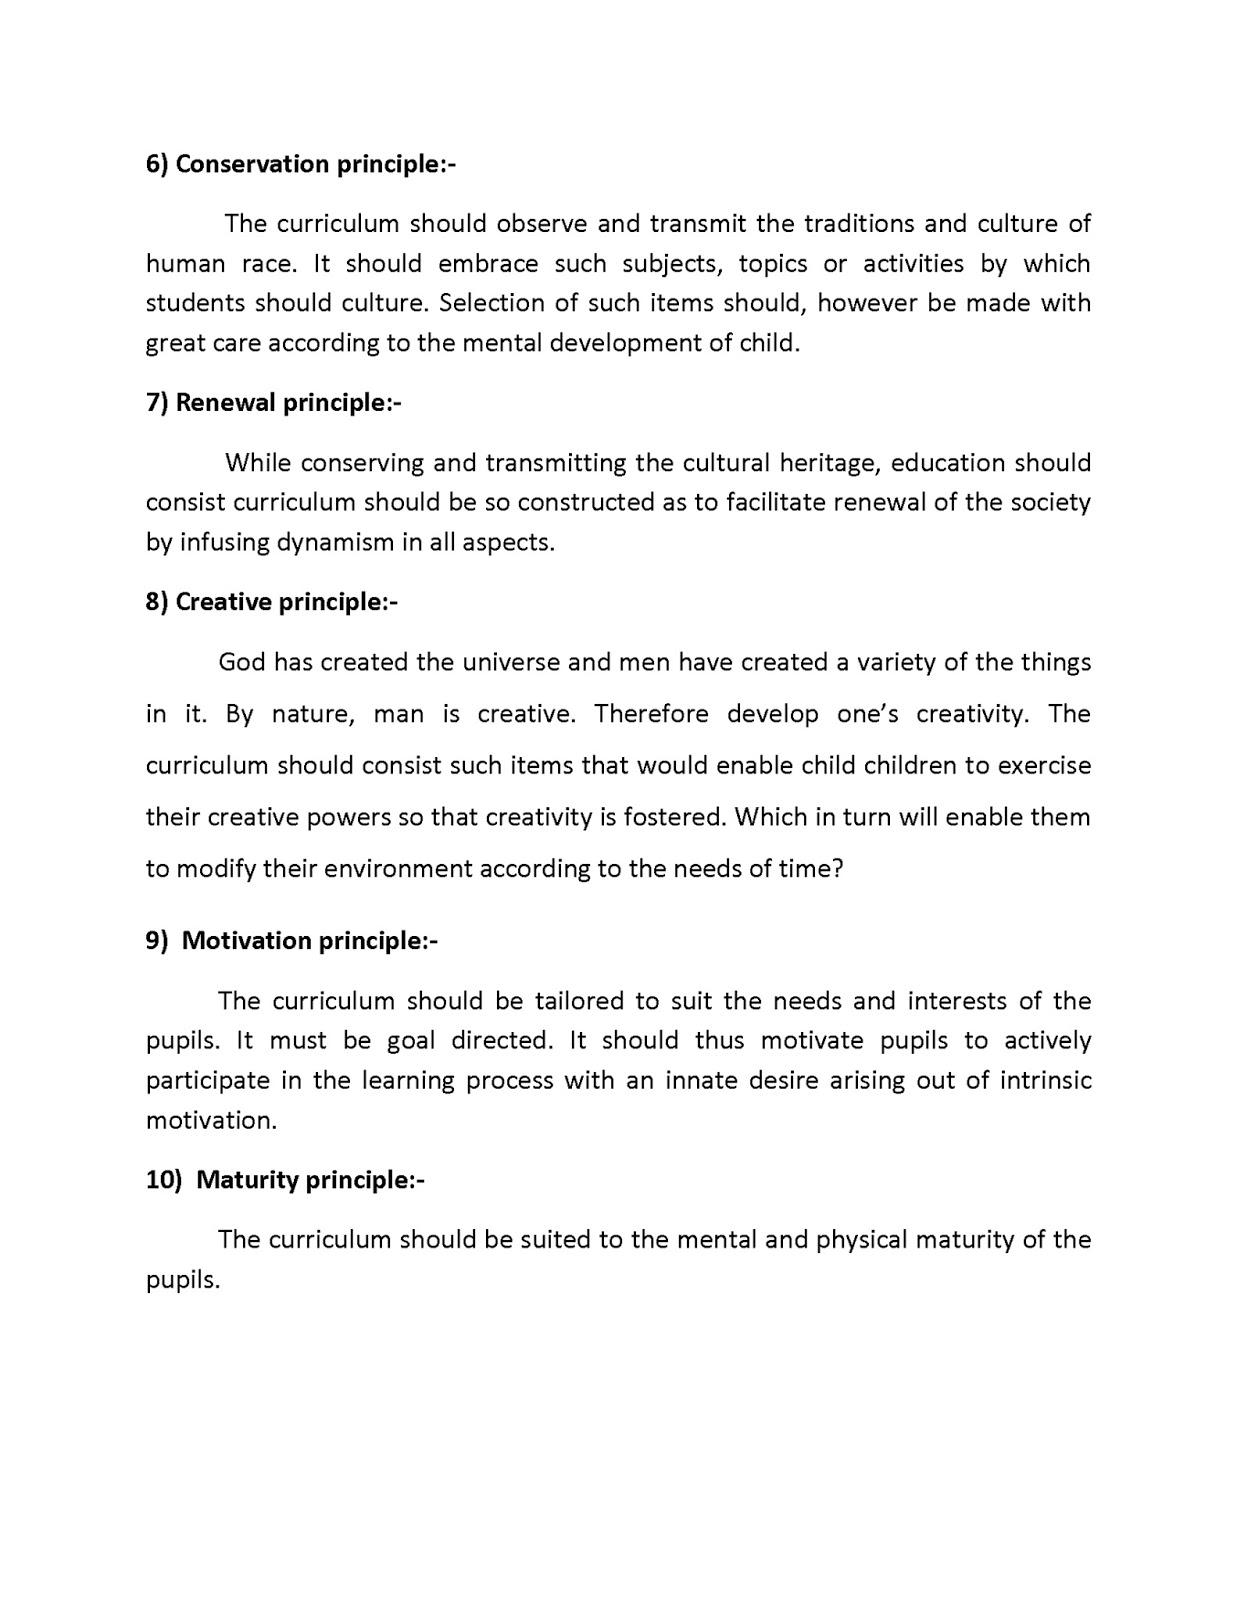 sheeba j blog online assignment topic social science posted by sheeba j at 02 21